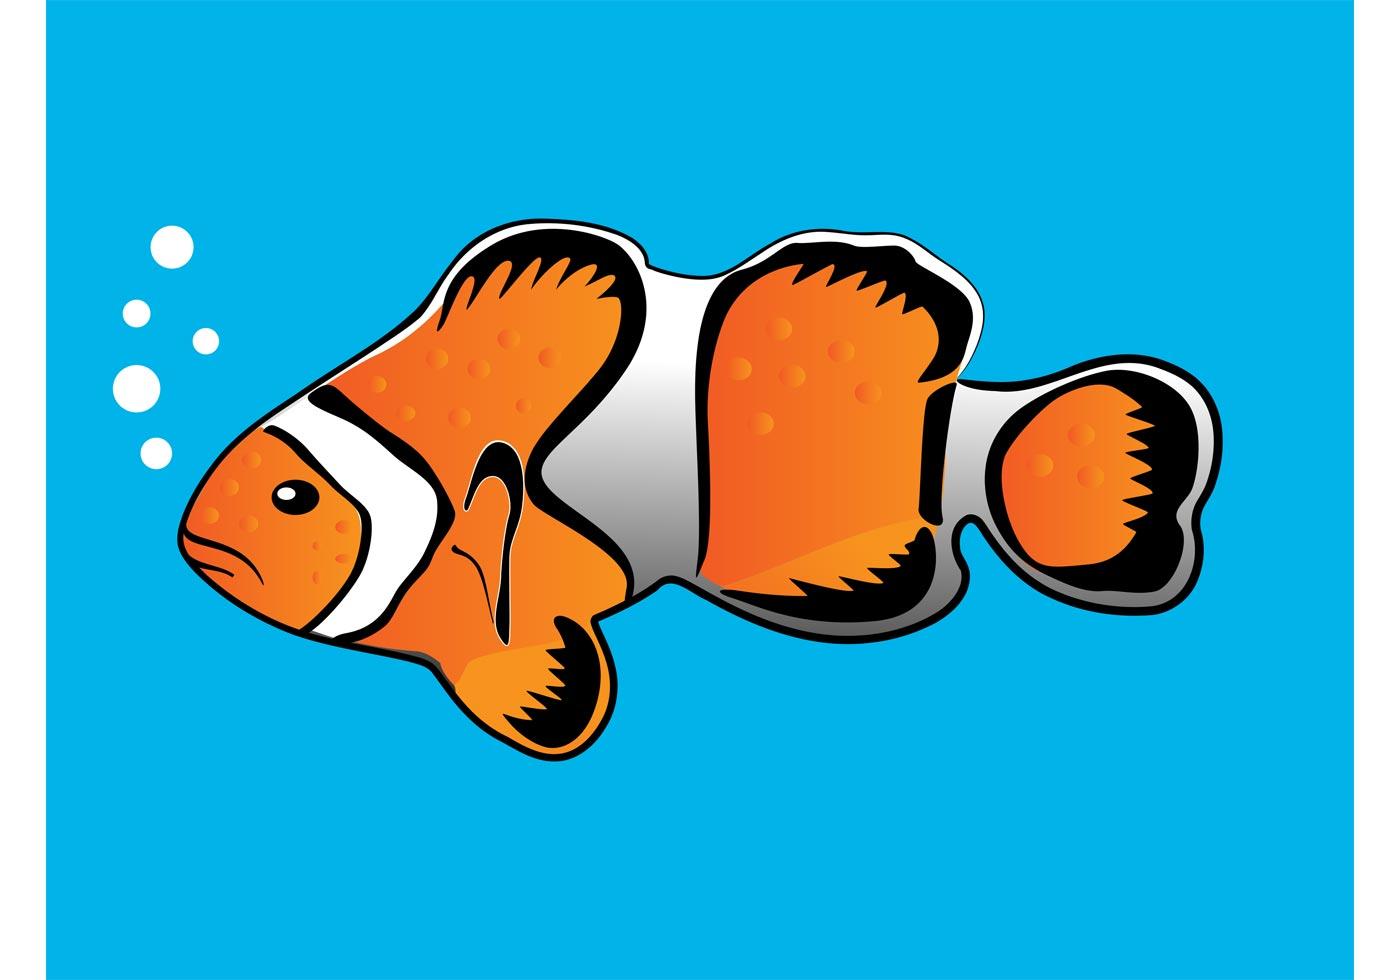 Clownfish Vector - Download Free Vector Art, Stock Graphics & Images